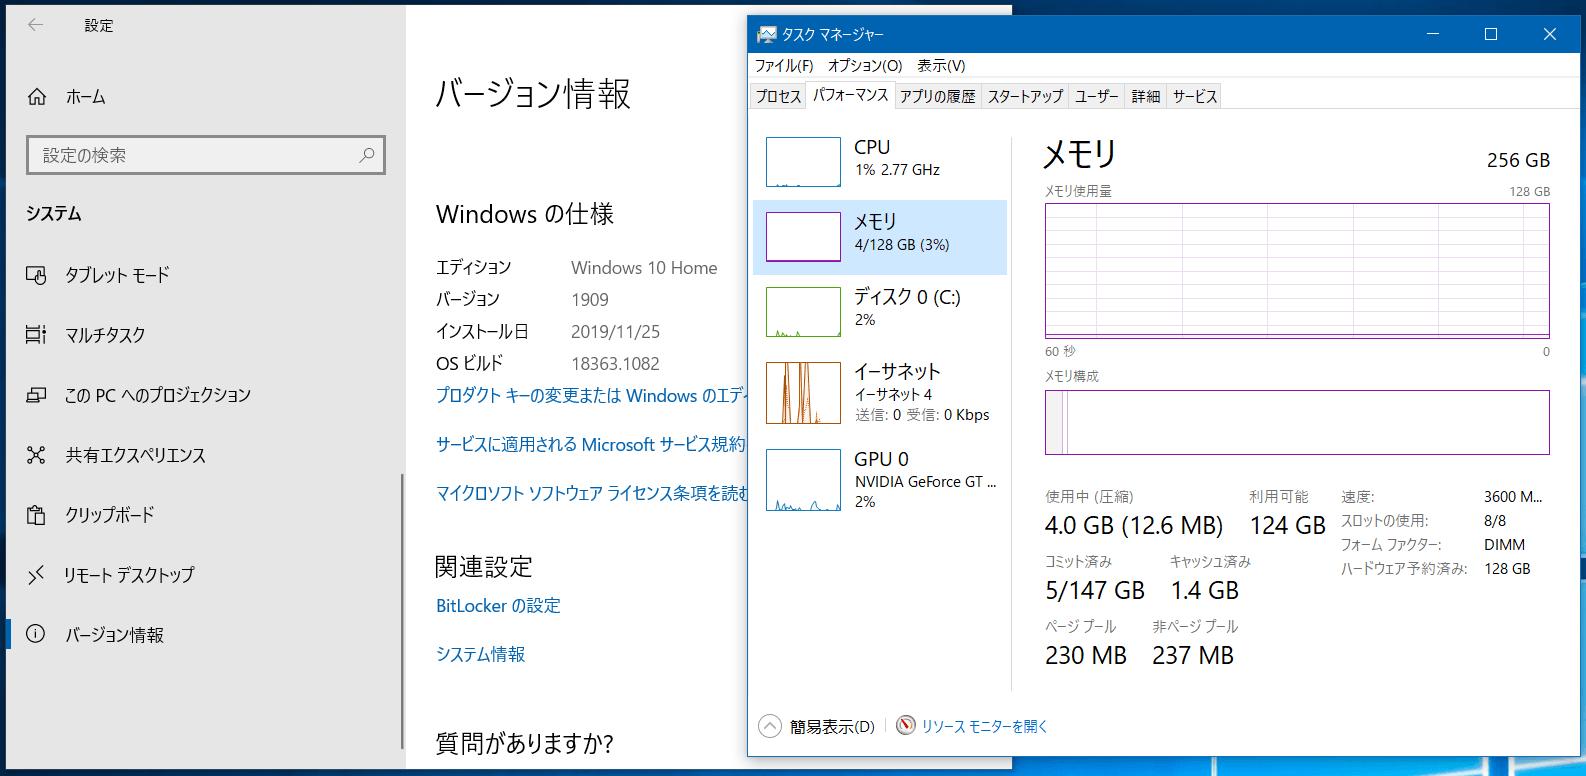 Windows10 Home_system-memory-upto128GB